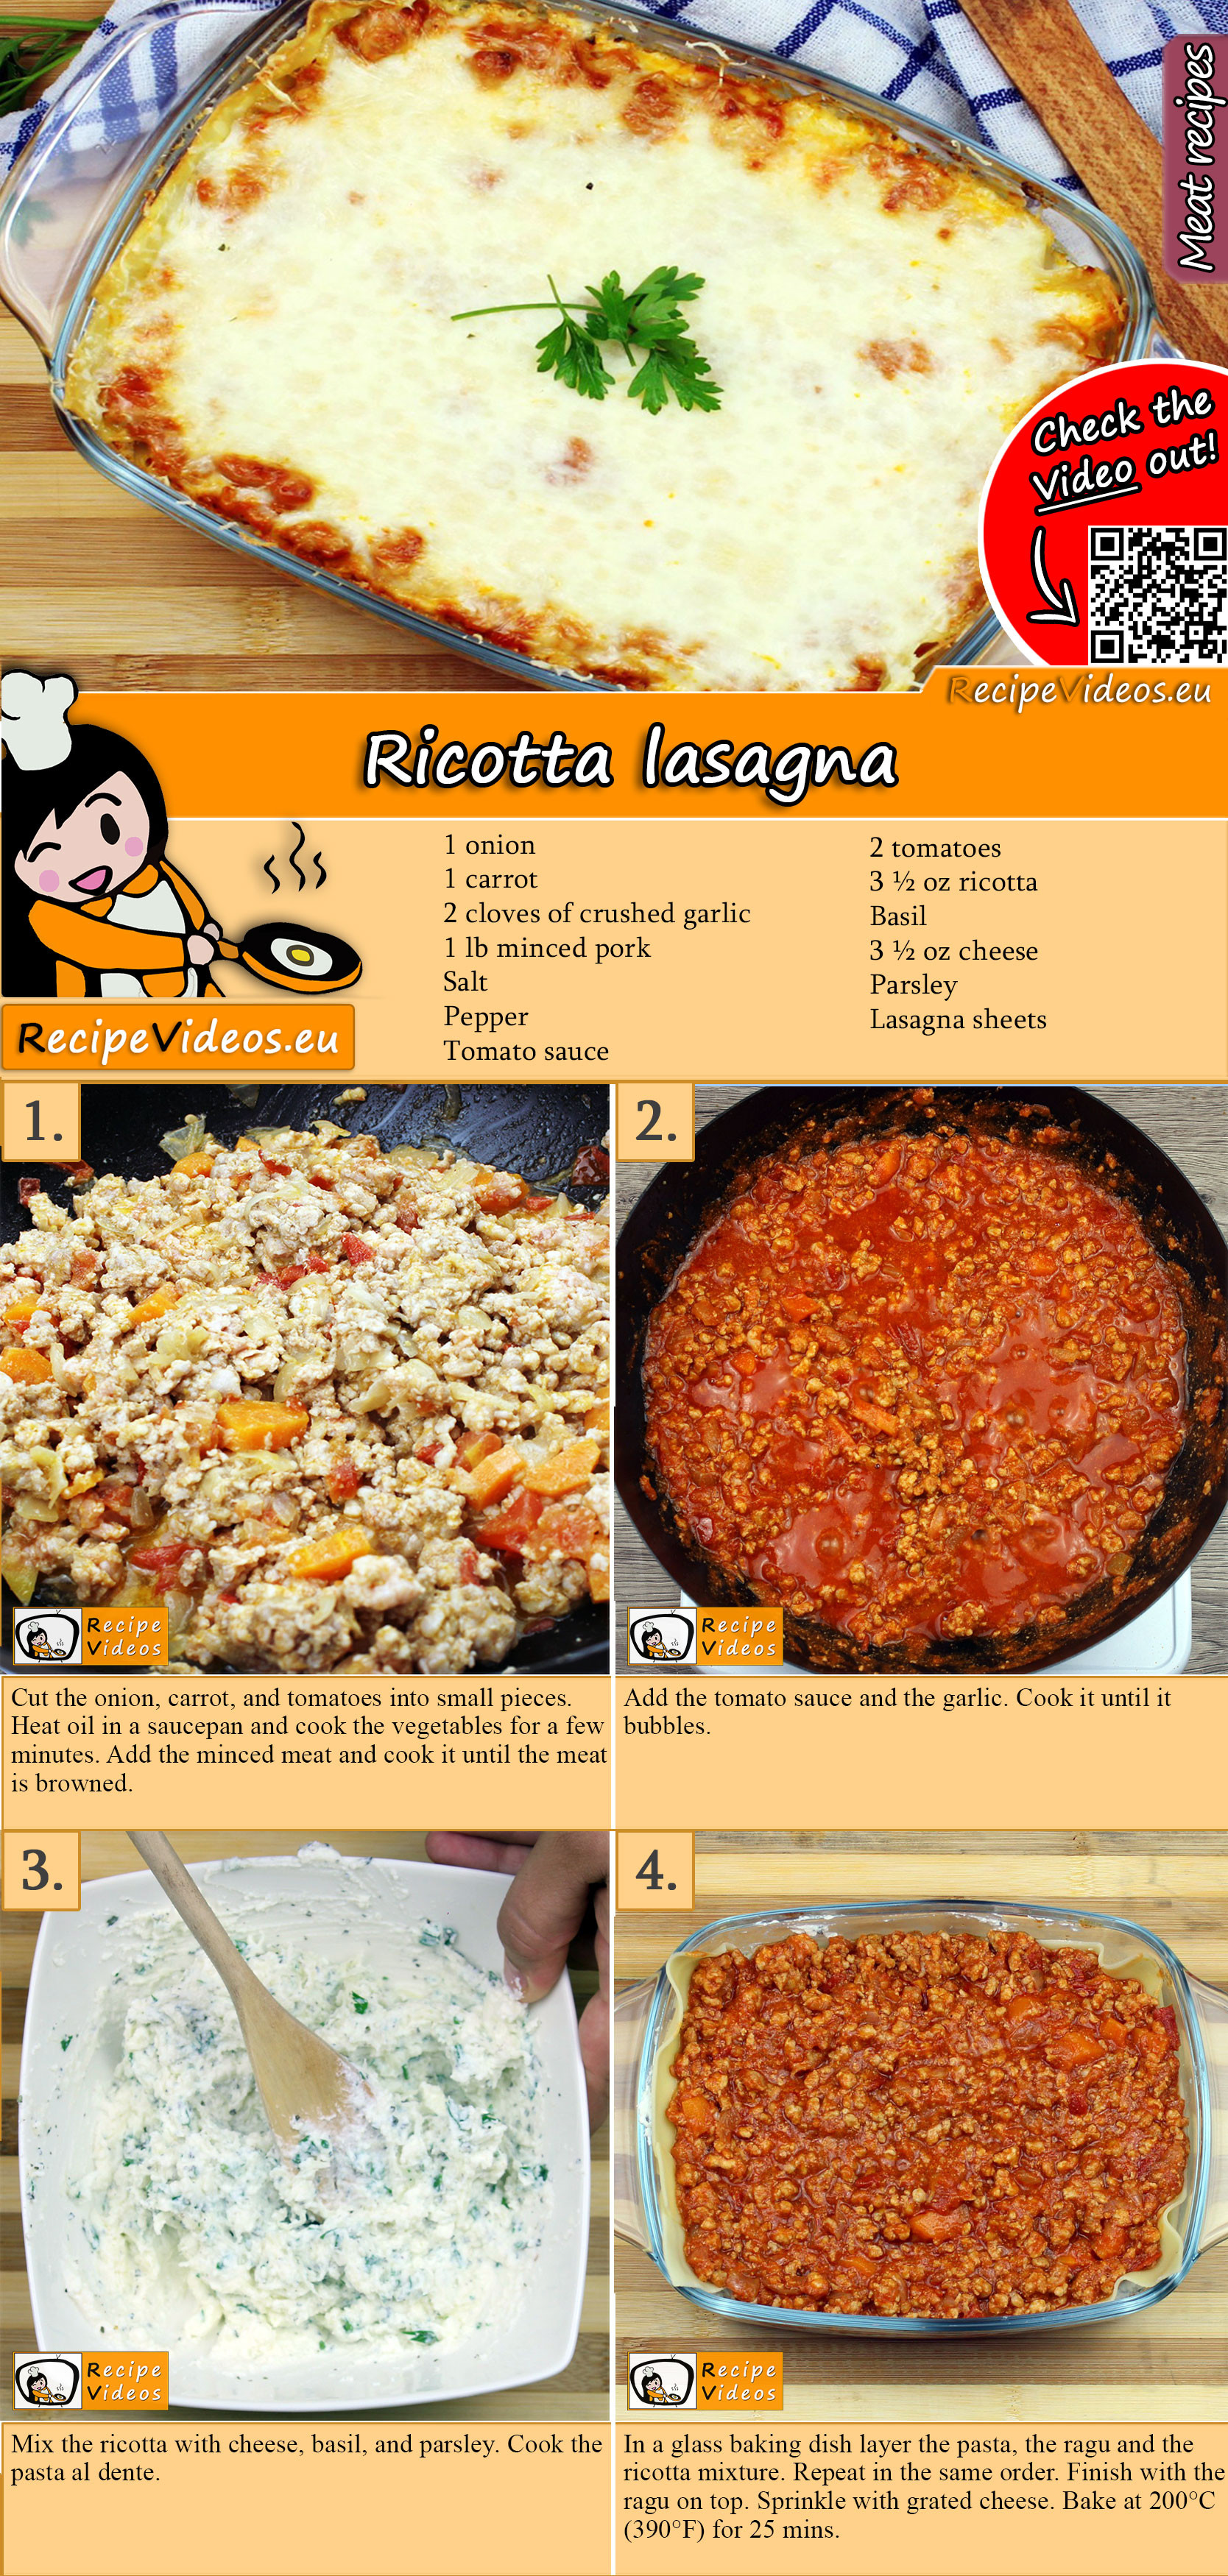 Ricotta lasagna recipe with video